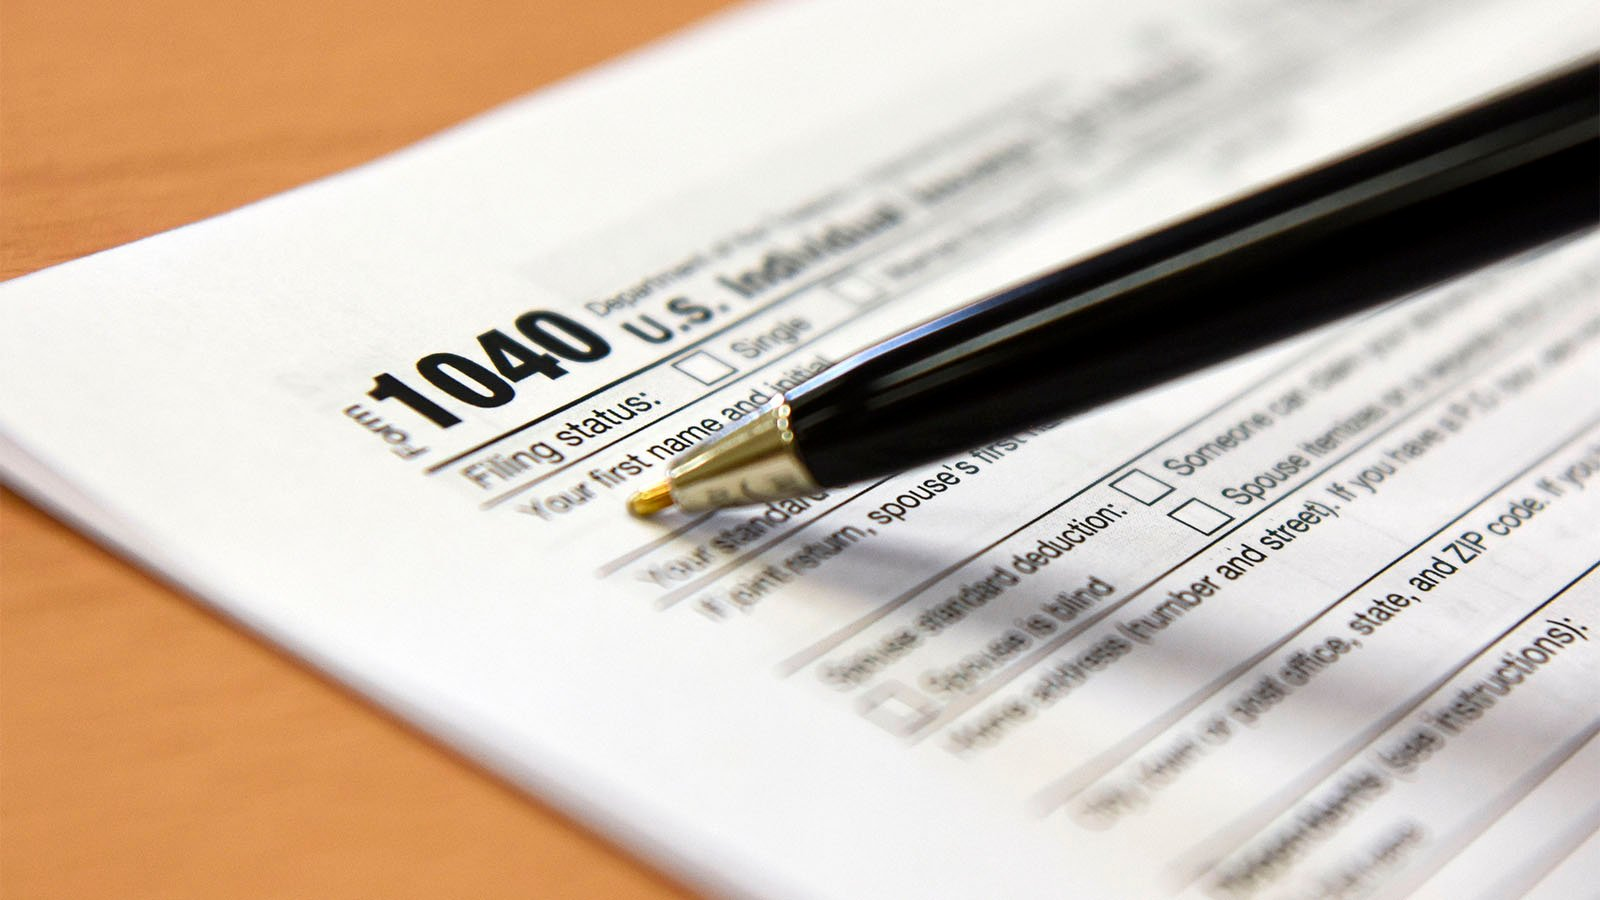 A U.S. individual income tax return 1040 form on Jan. 17, 2019. (U.S. Air Force photo by Senior Airman Savannah L. Waters)